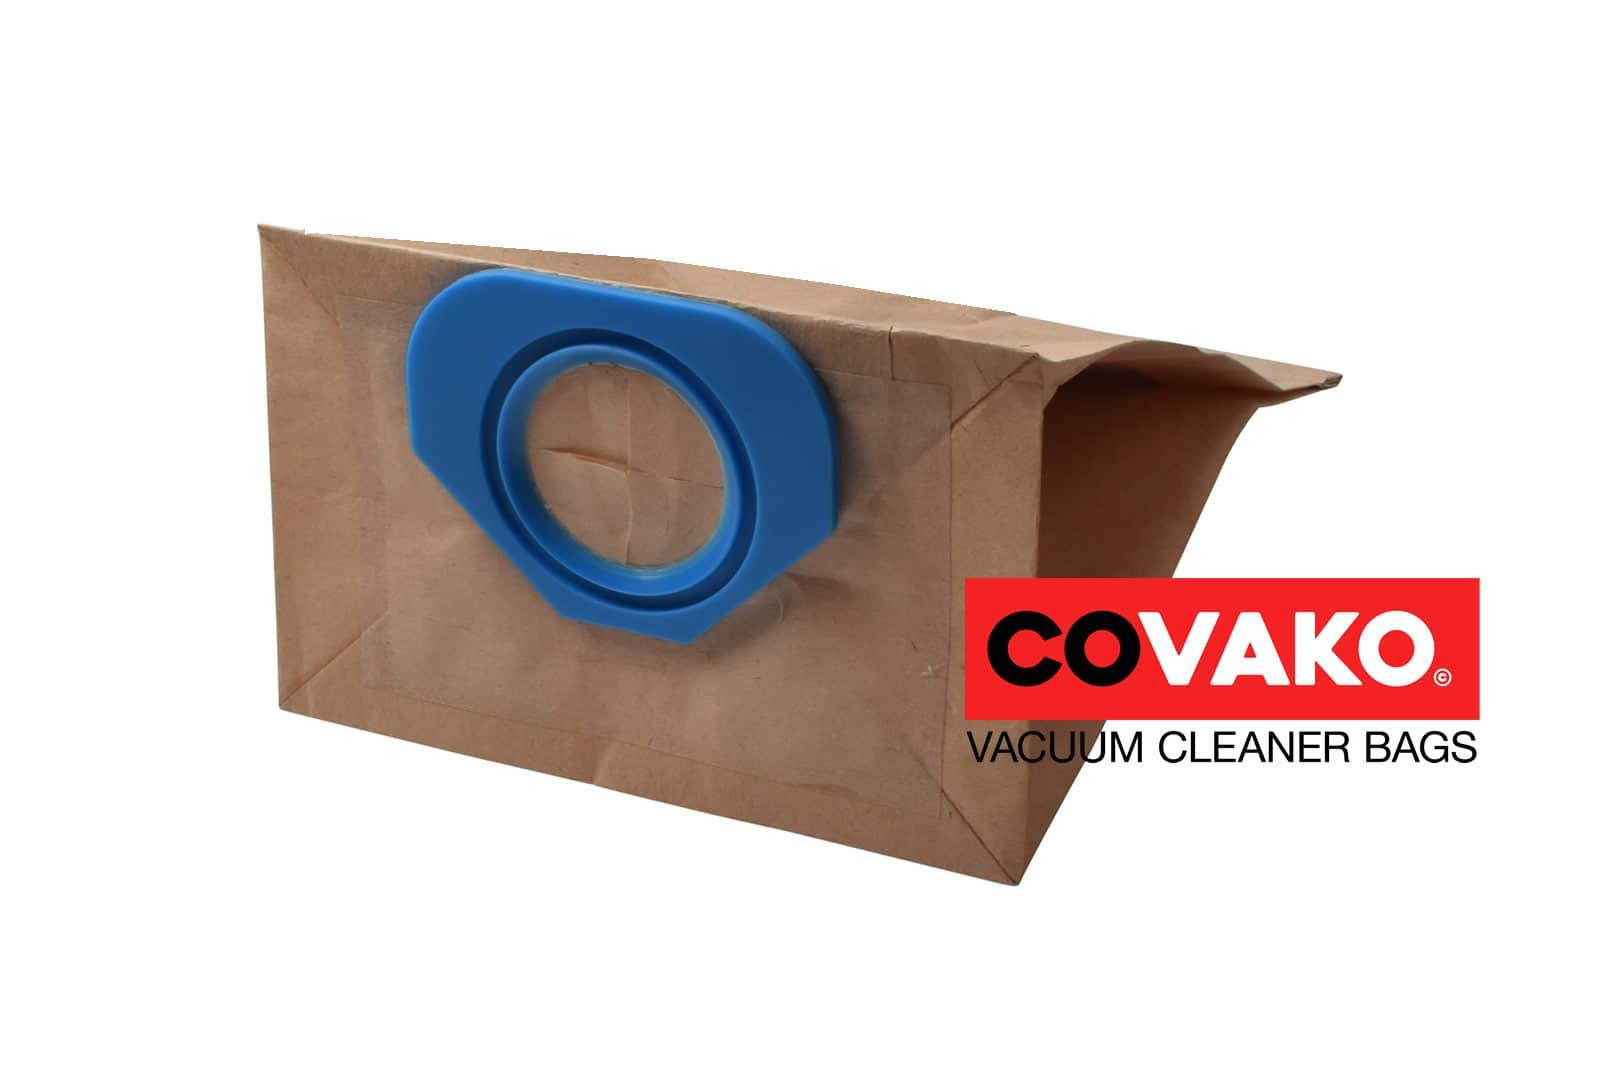 Nilfisk GA 70 / Papier - Nilfisk sacs d'aspirateur